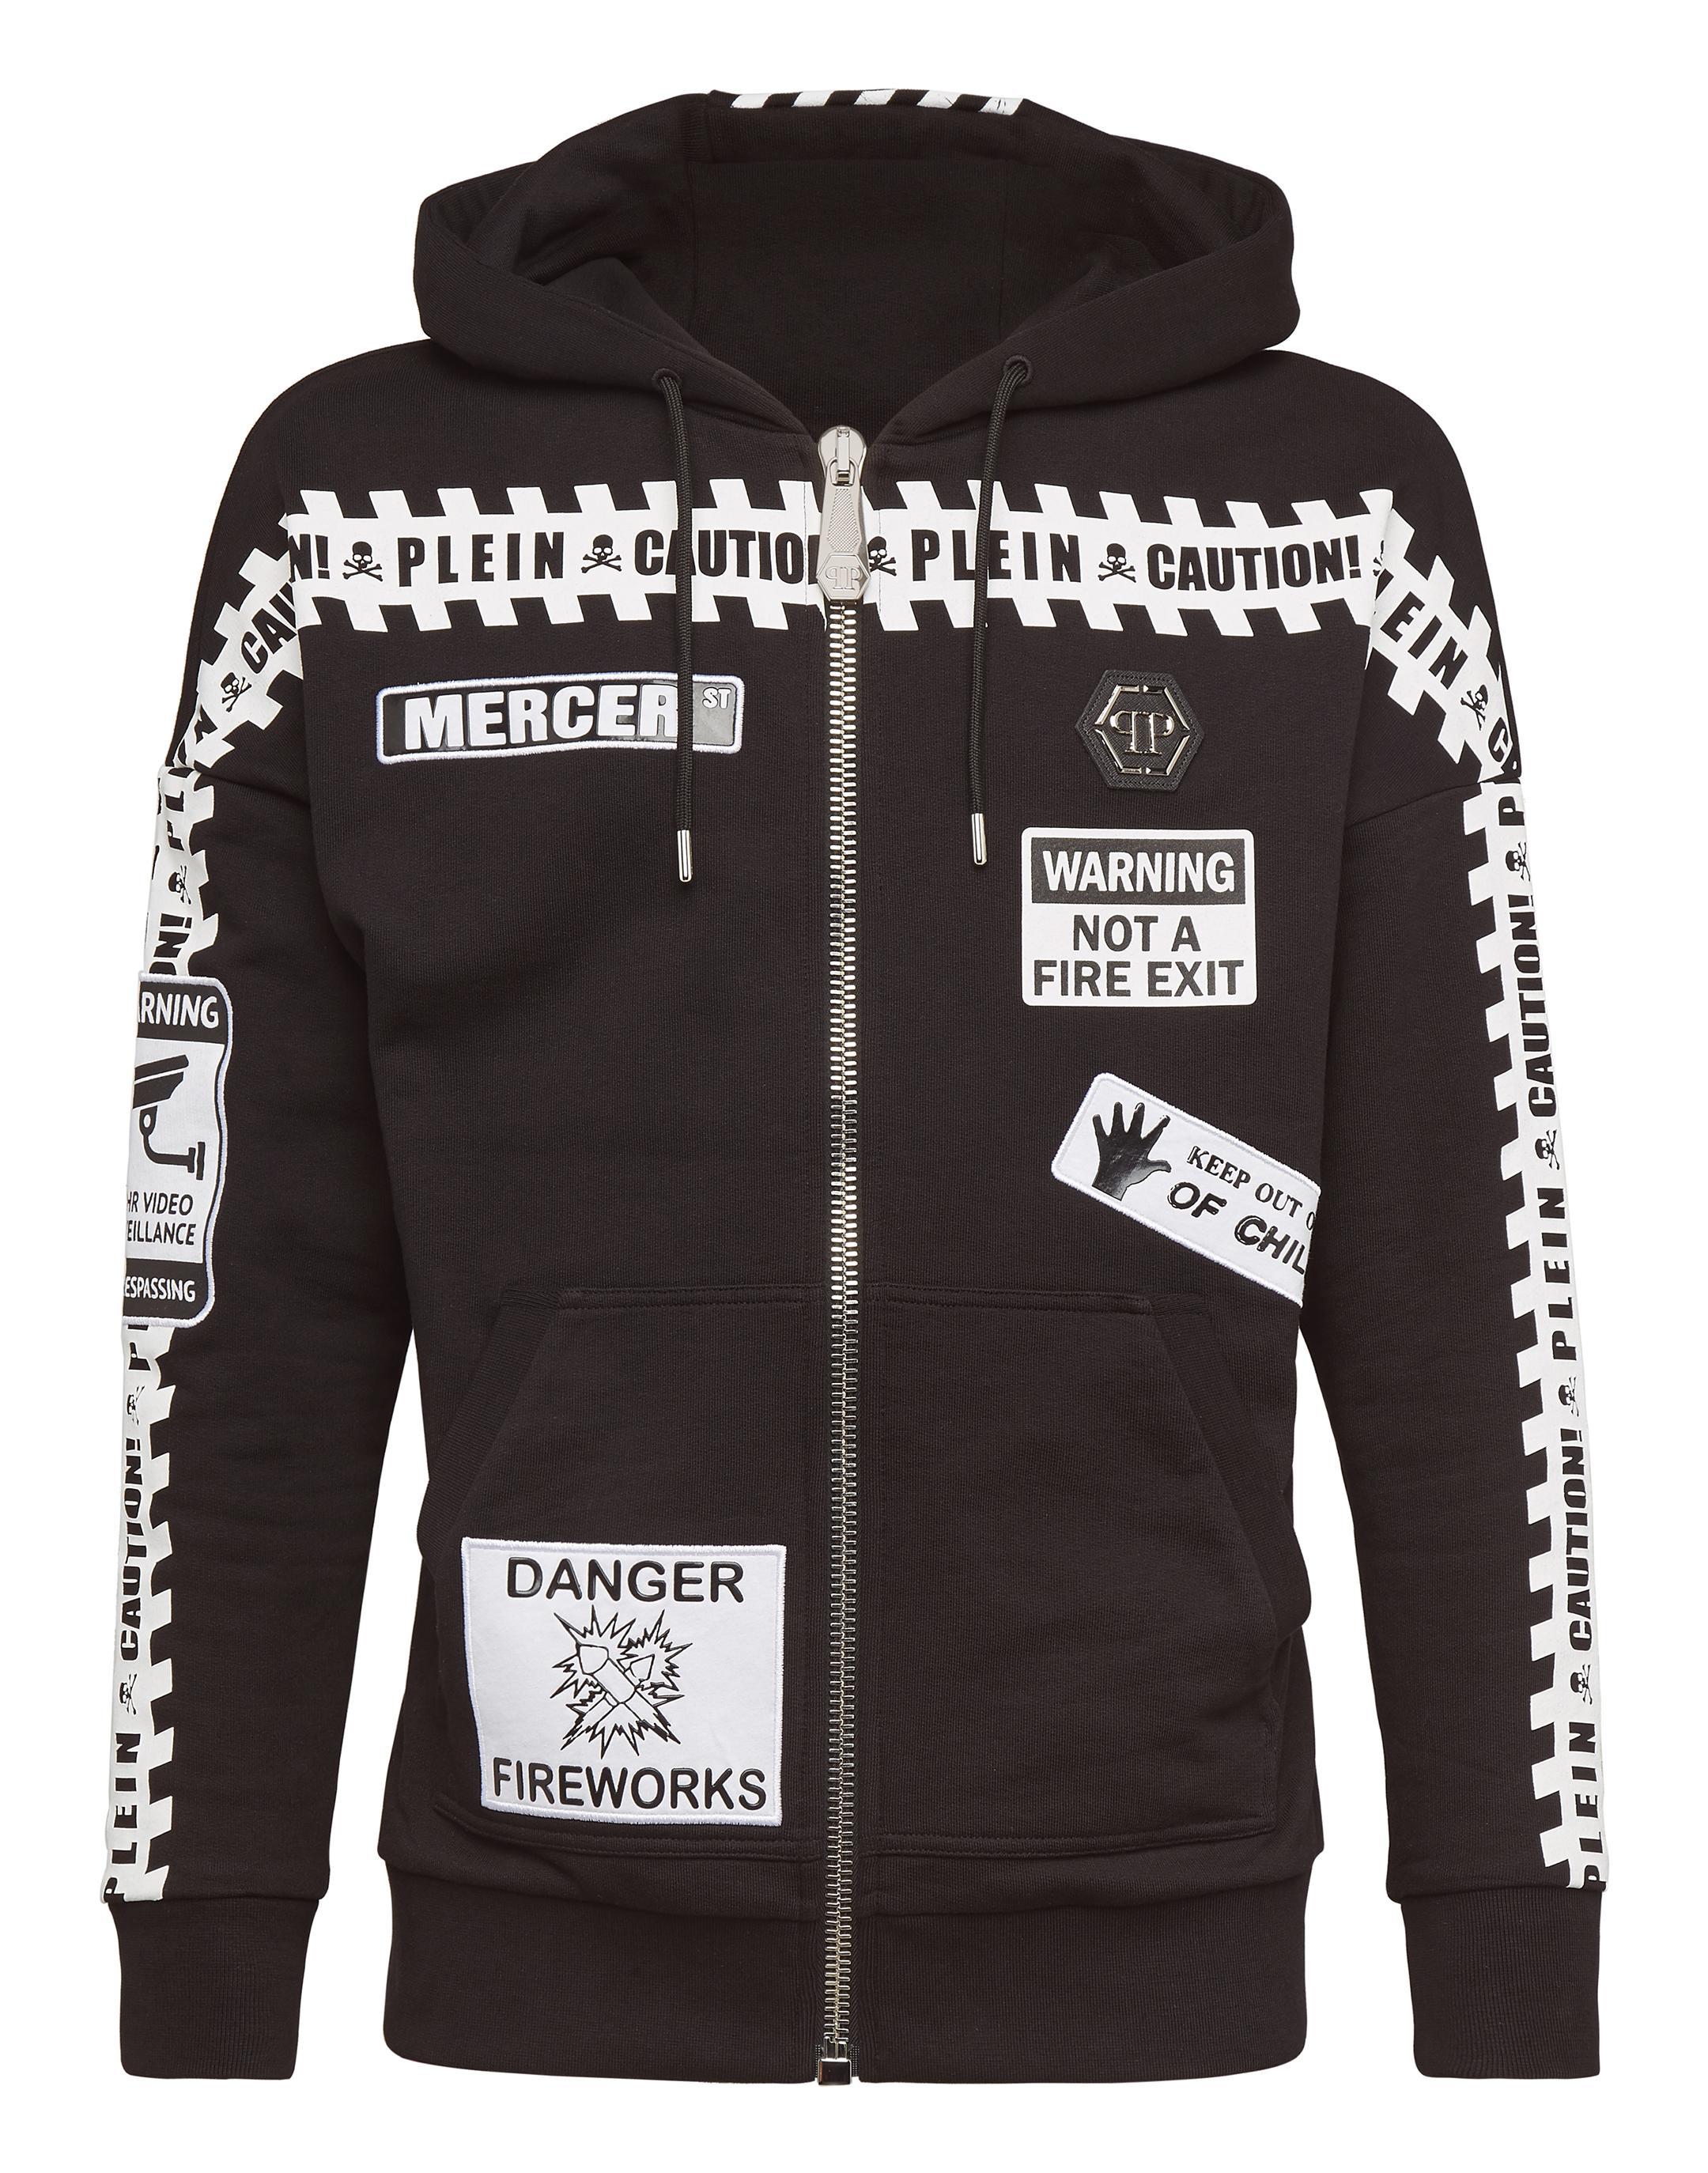 Philipp Plein Hoodie Sweatjacket Mm Warning In Black / White